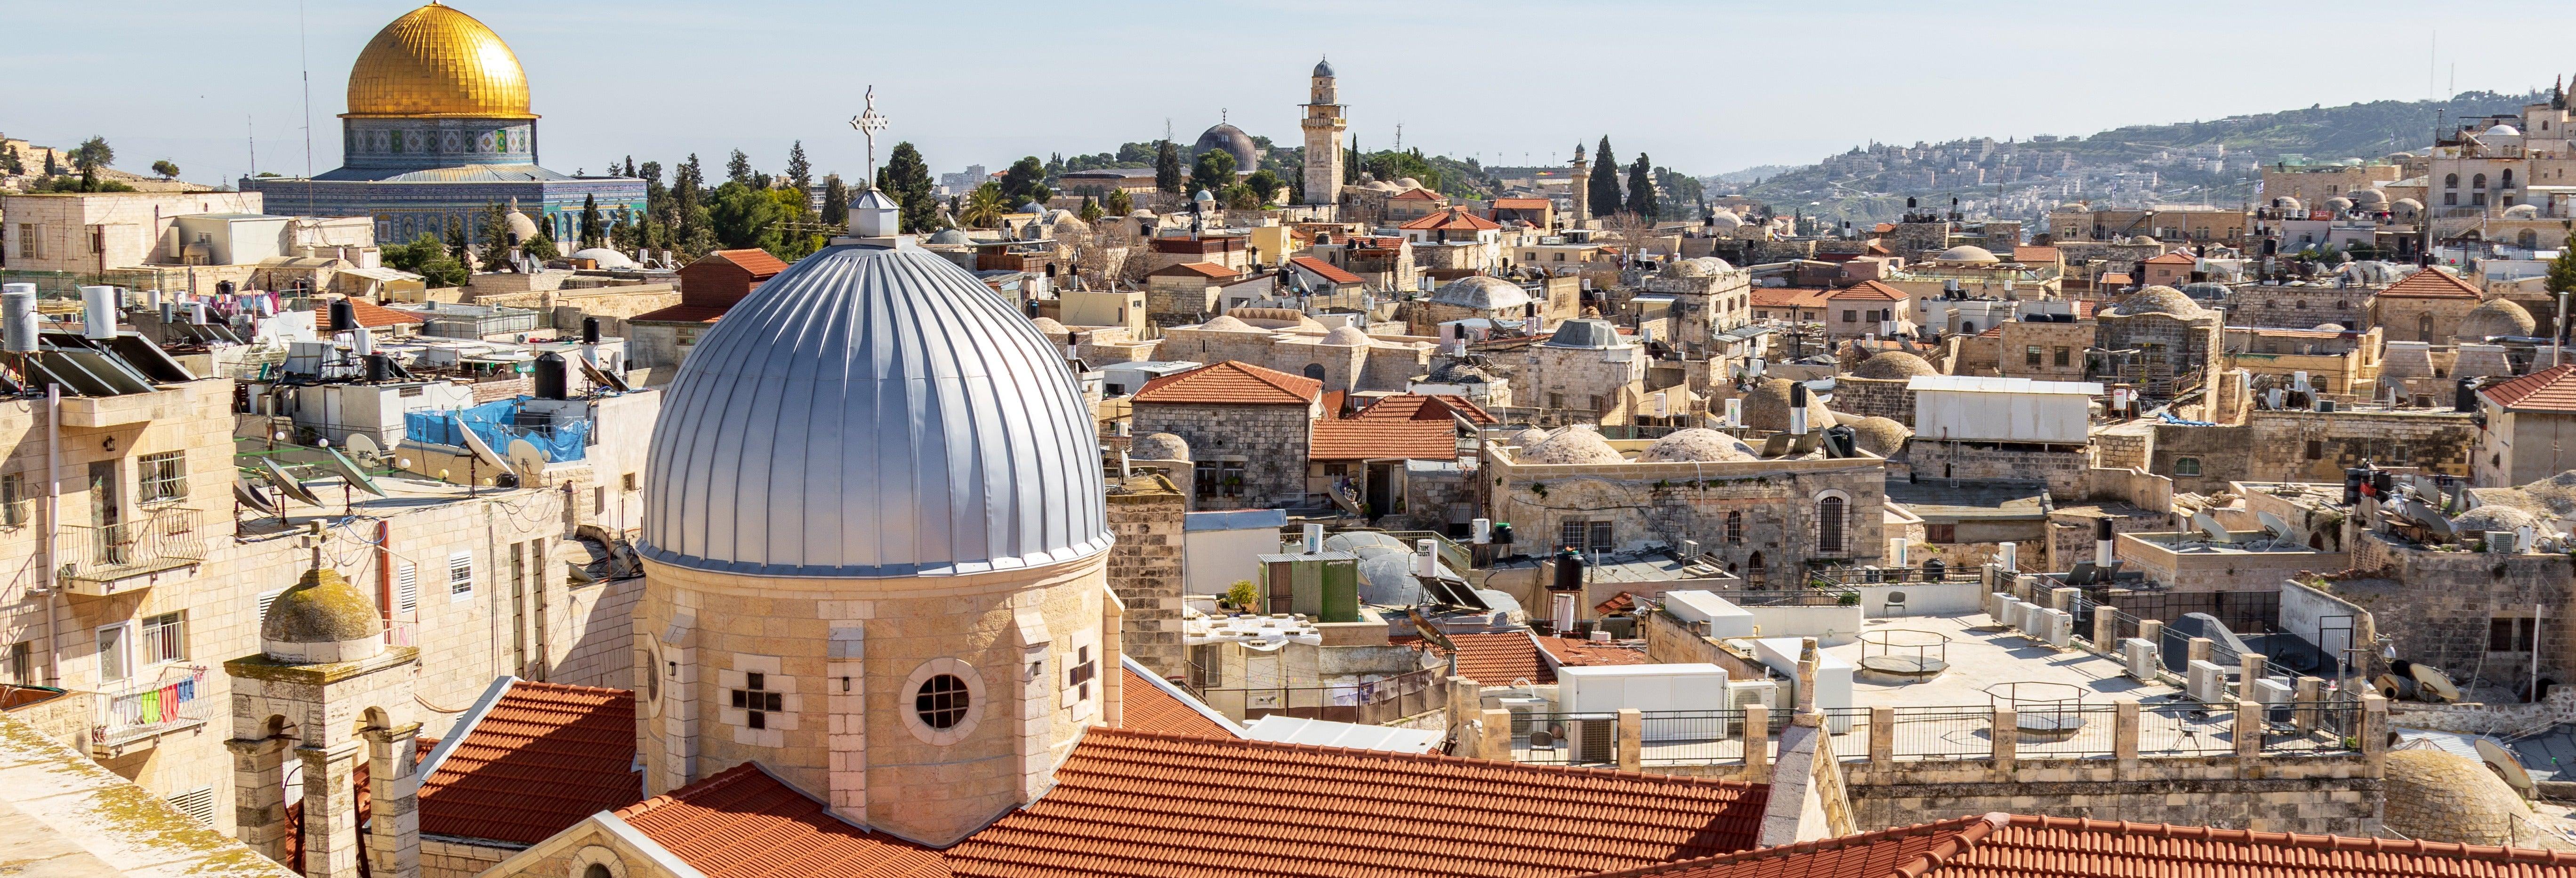 Visita guidata di Gerusalemme al completo